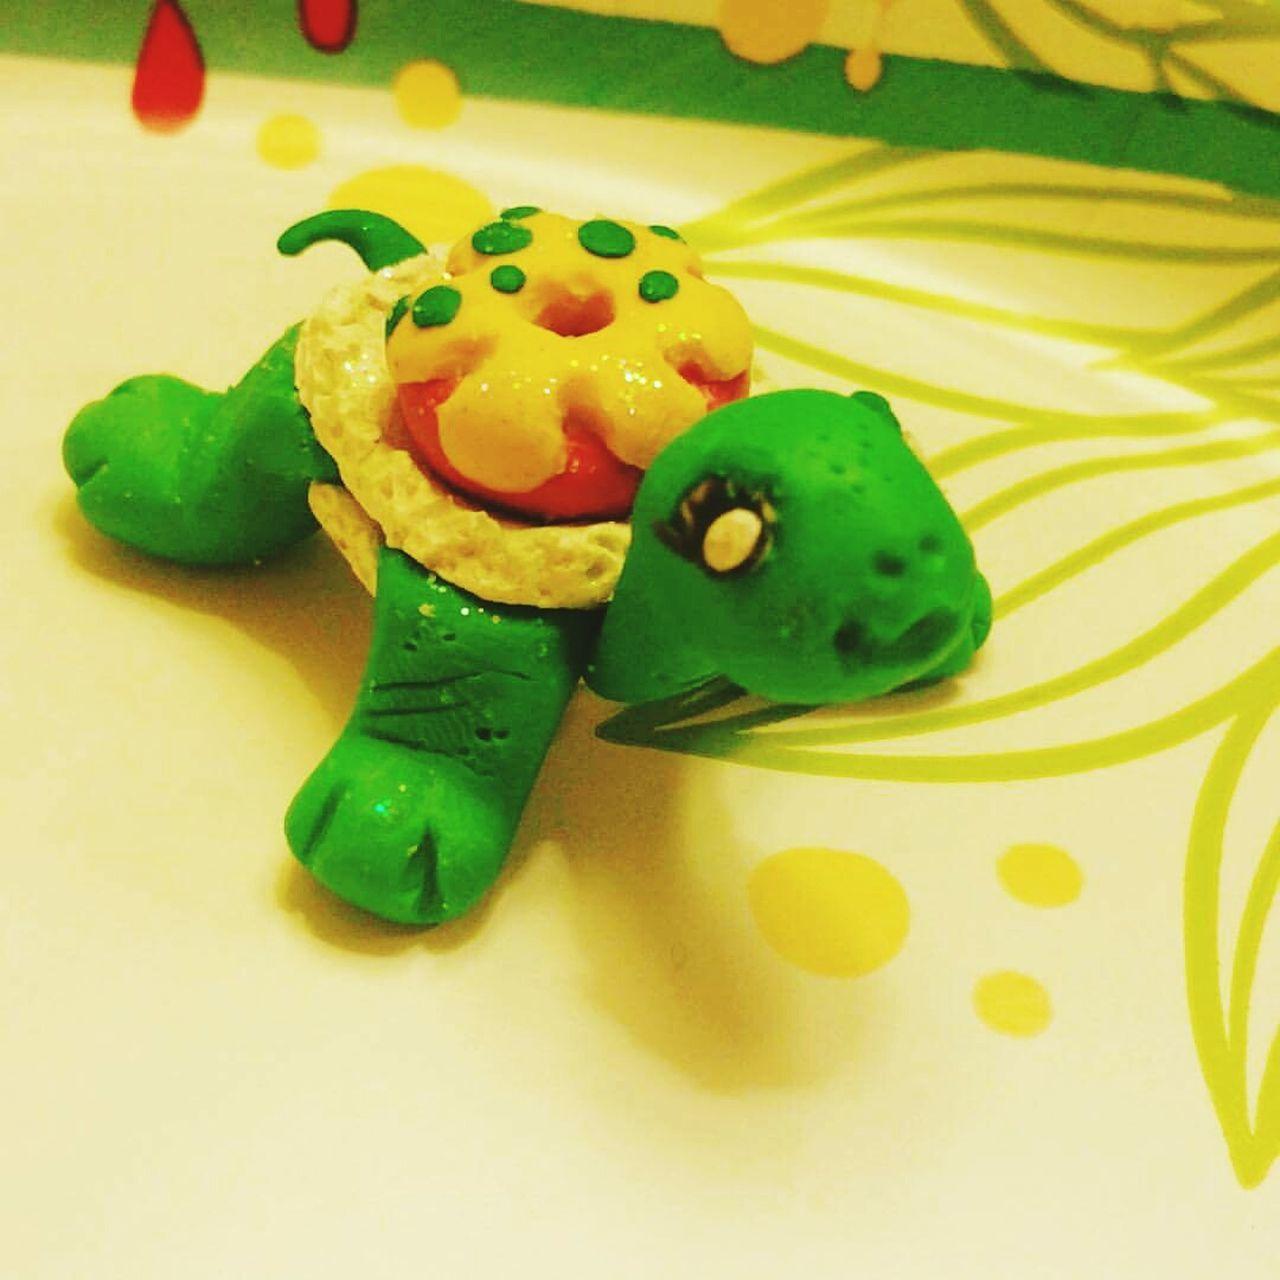 Polymerclay Sandiego Handmade Turtle Donut Hanging Out Craft Shugamoon Hello World